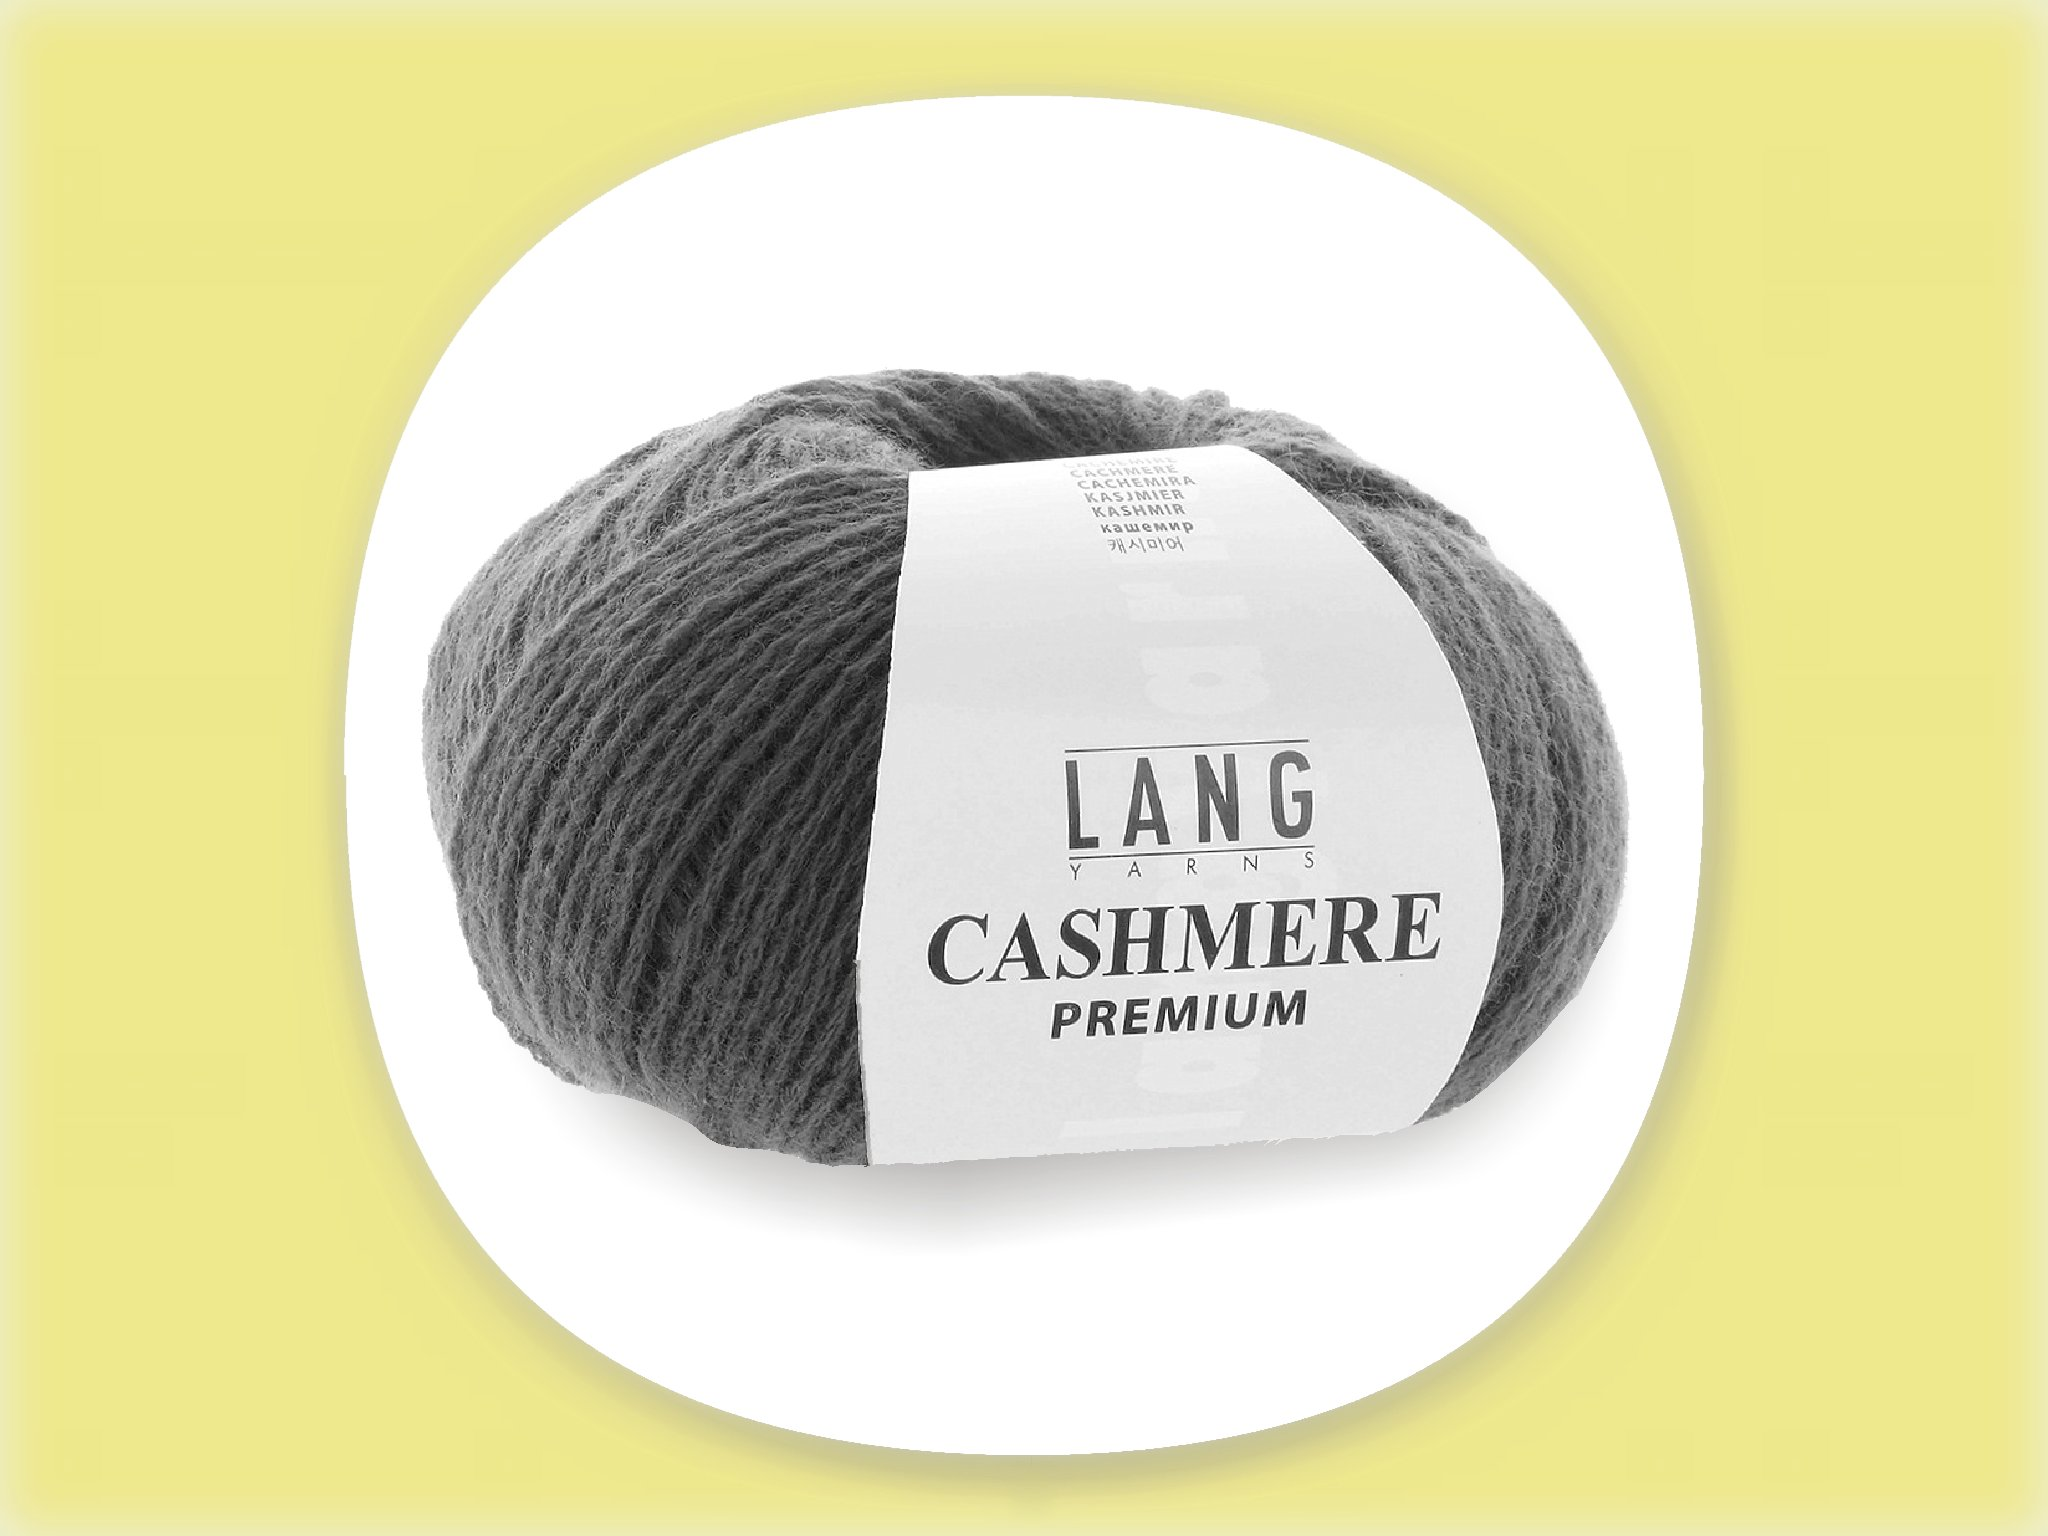 LANG Cashmere Premium